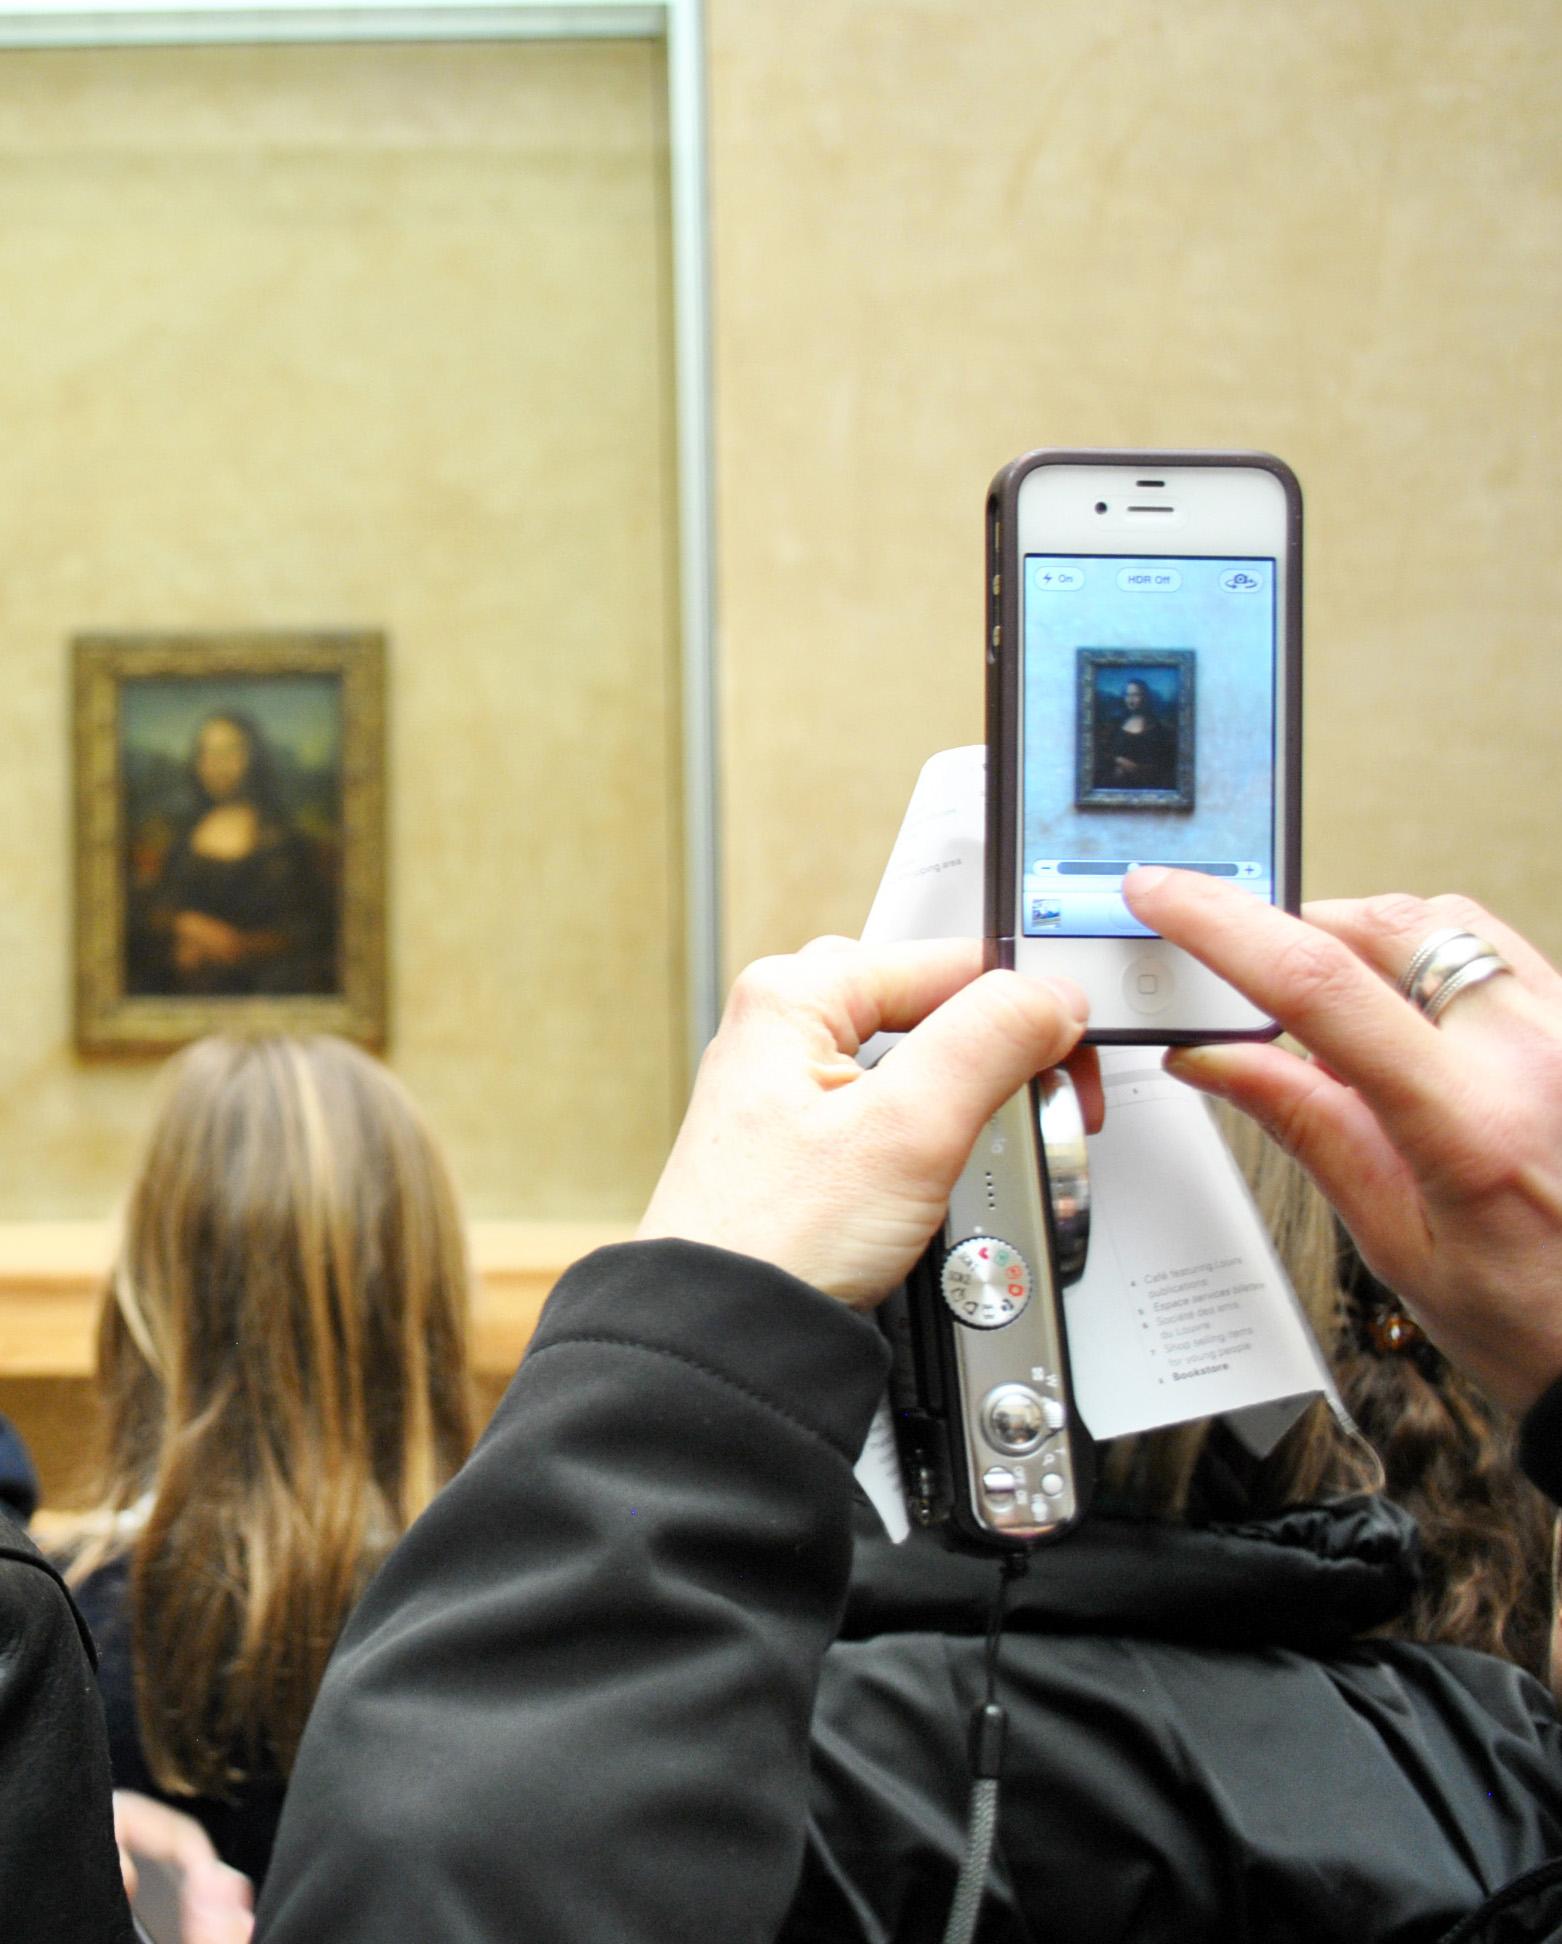 MonaLisa_fotografiada_en_el_Louvre